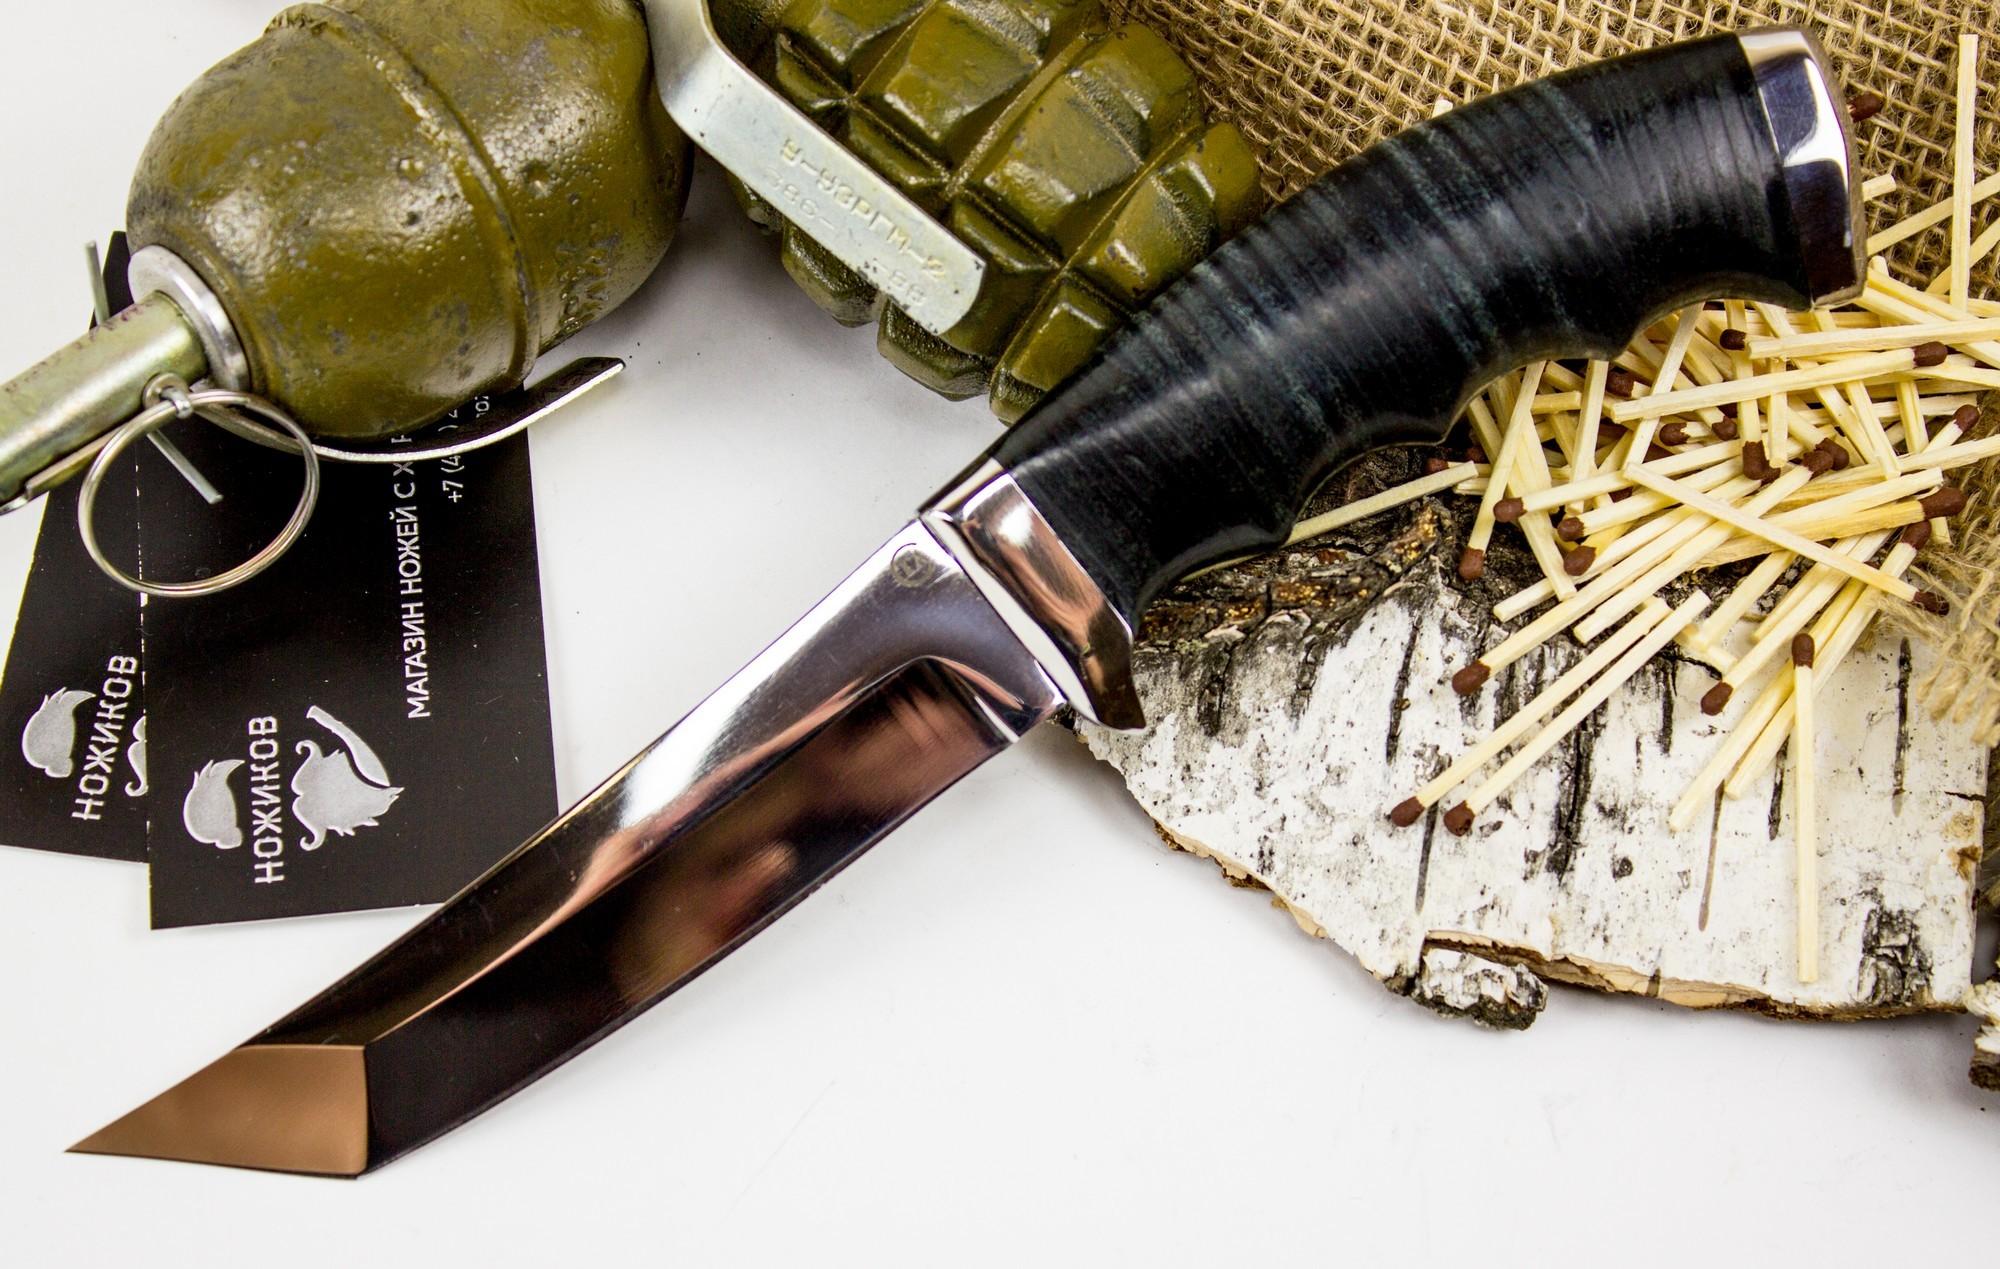 Нож Аркан, сталь 95х18, кожа нож аркан р в коже 95х18